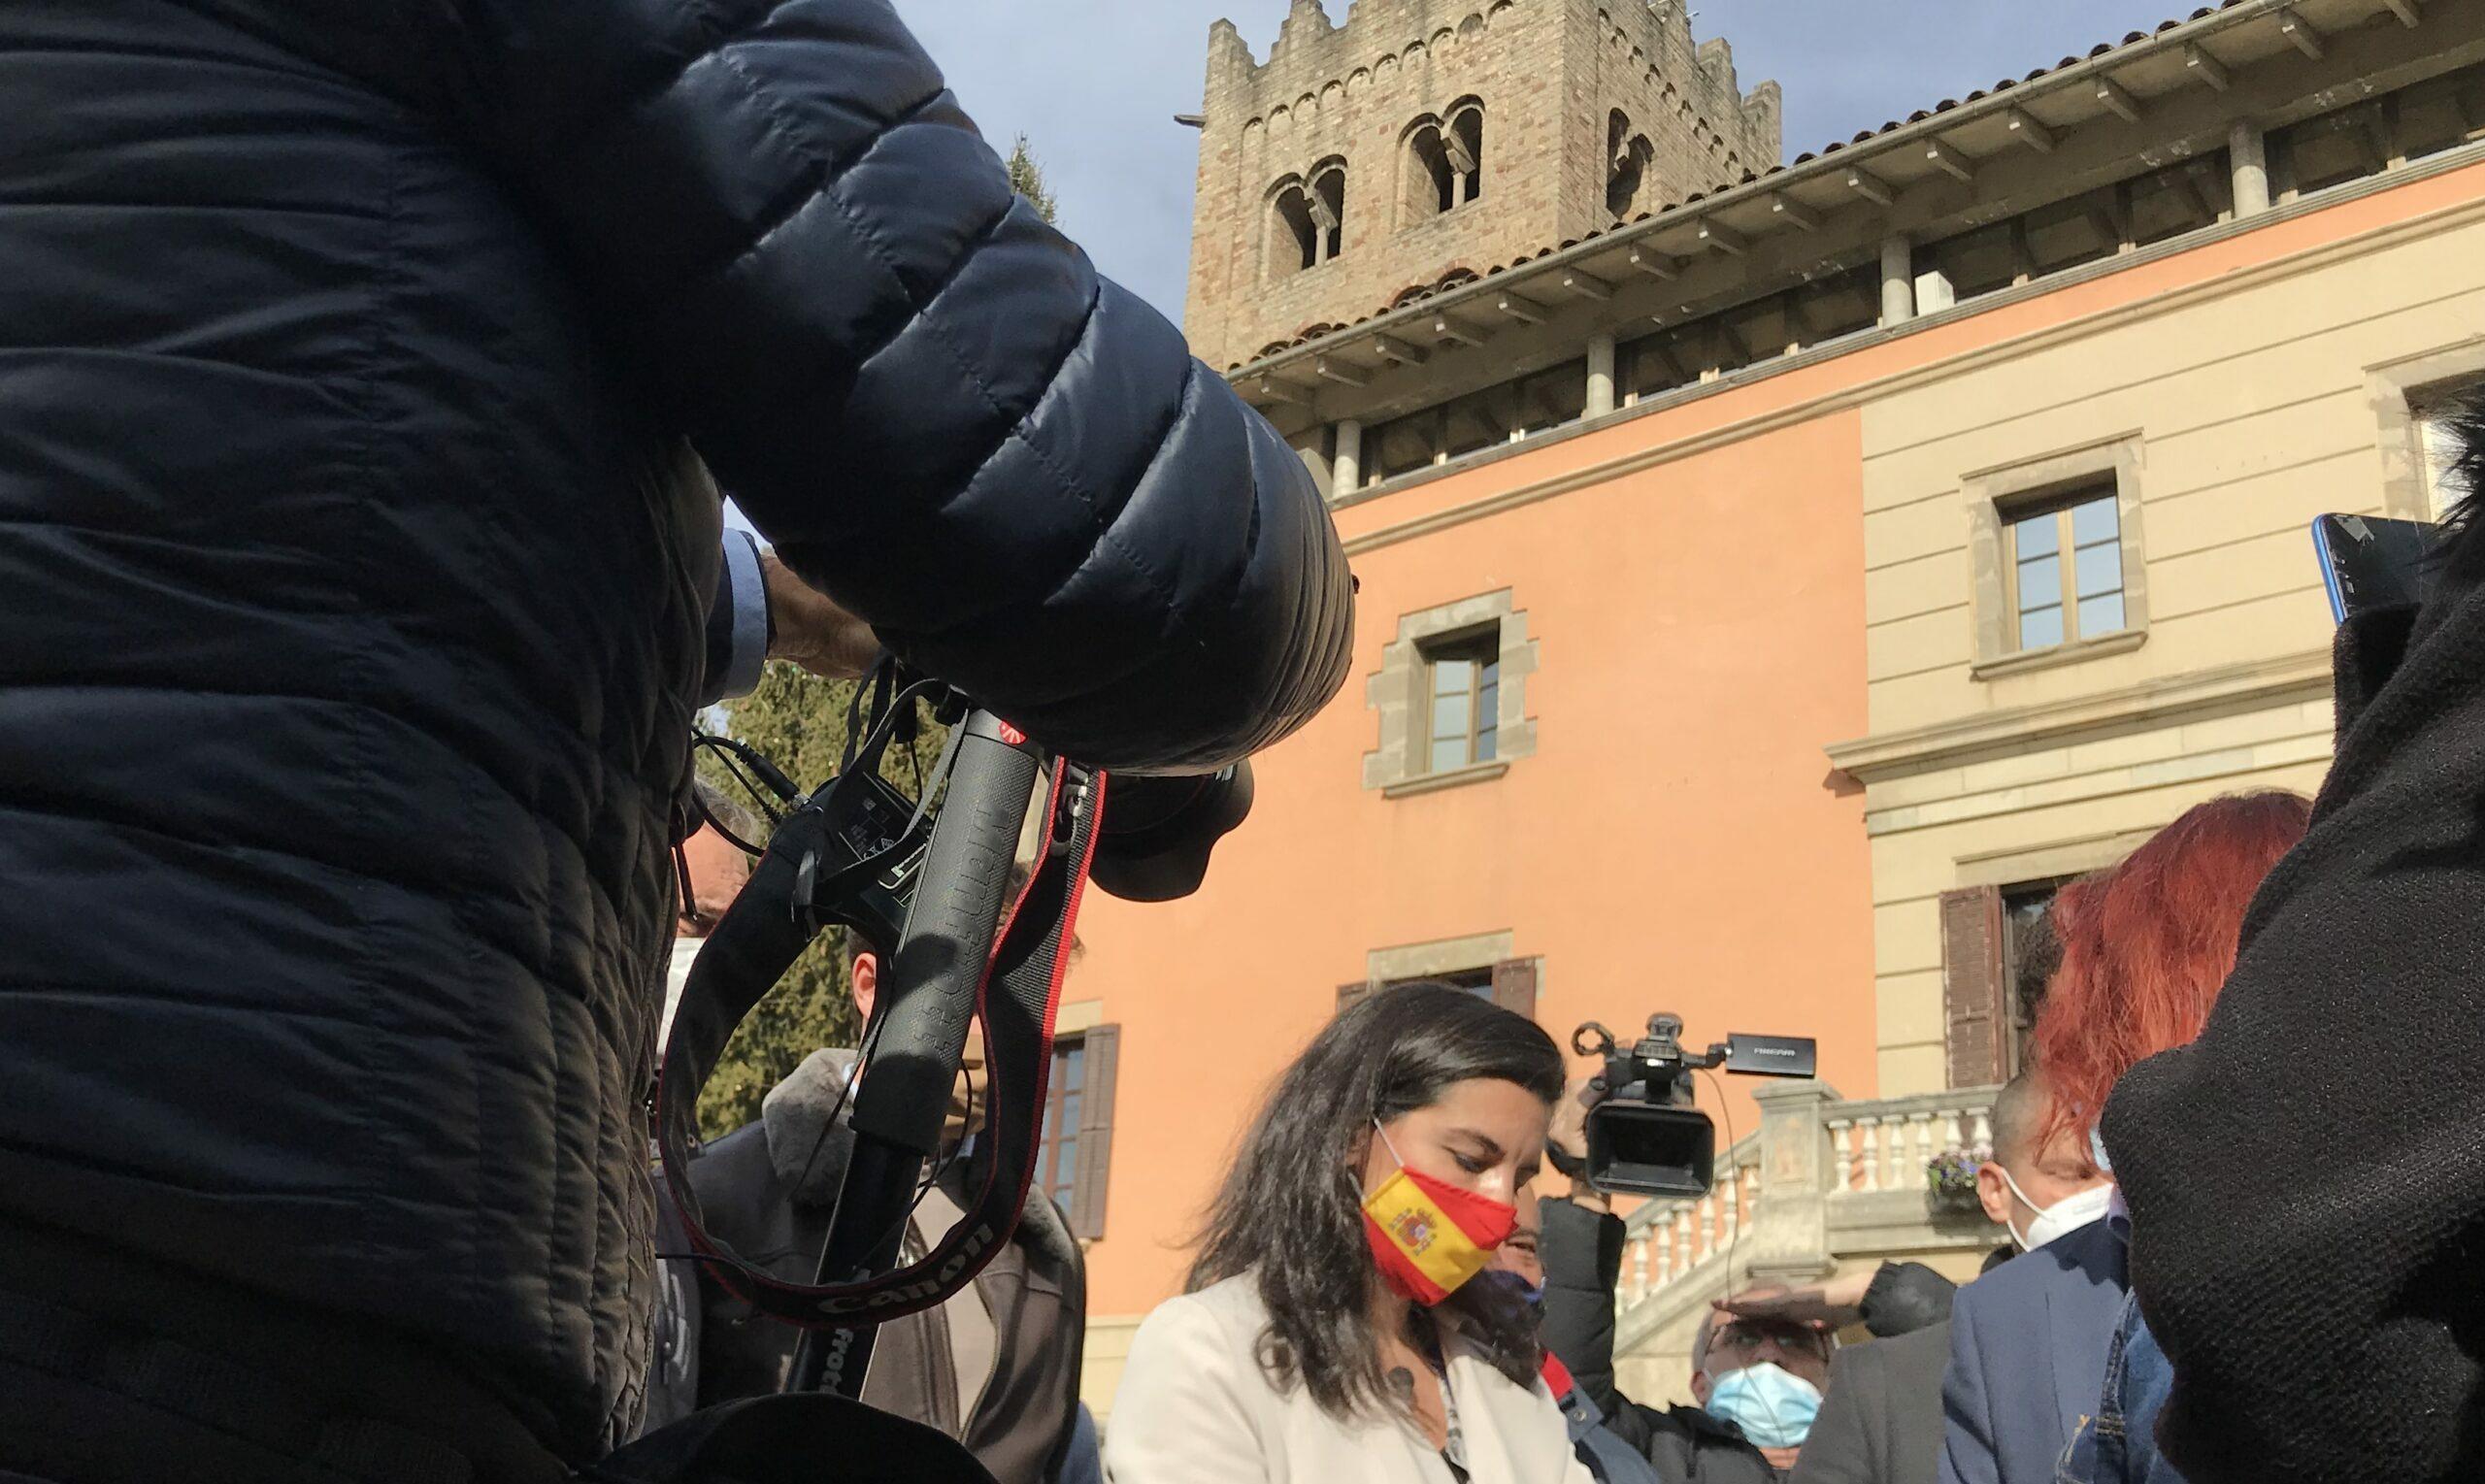 Rocio Monasterio amb mascareta espanyola i  el monestir de Ripoll de fons/QS